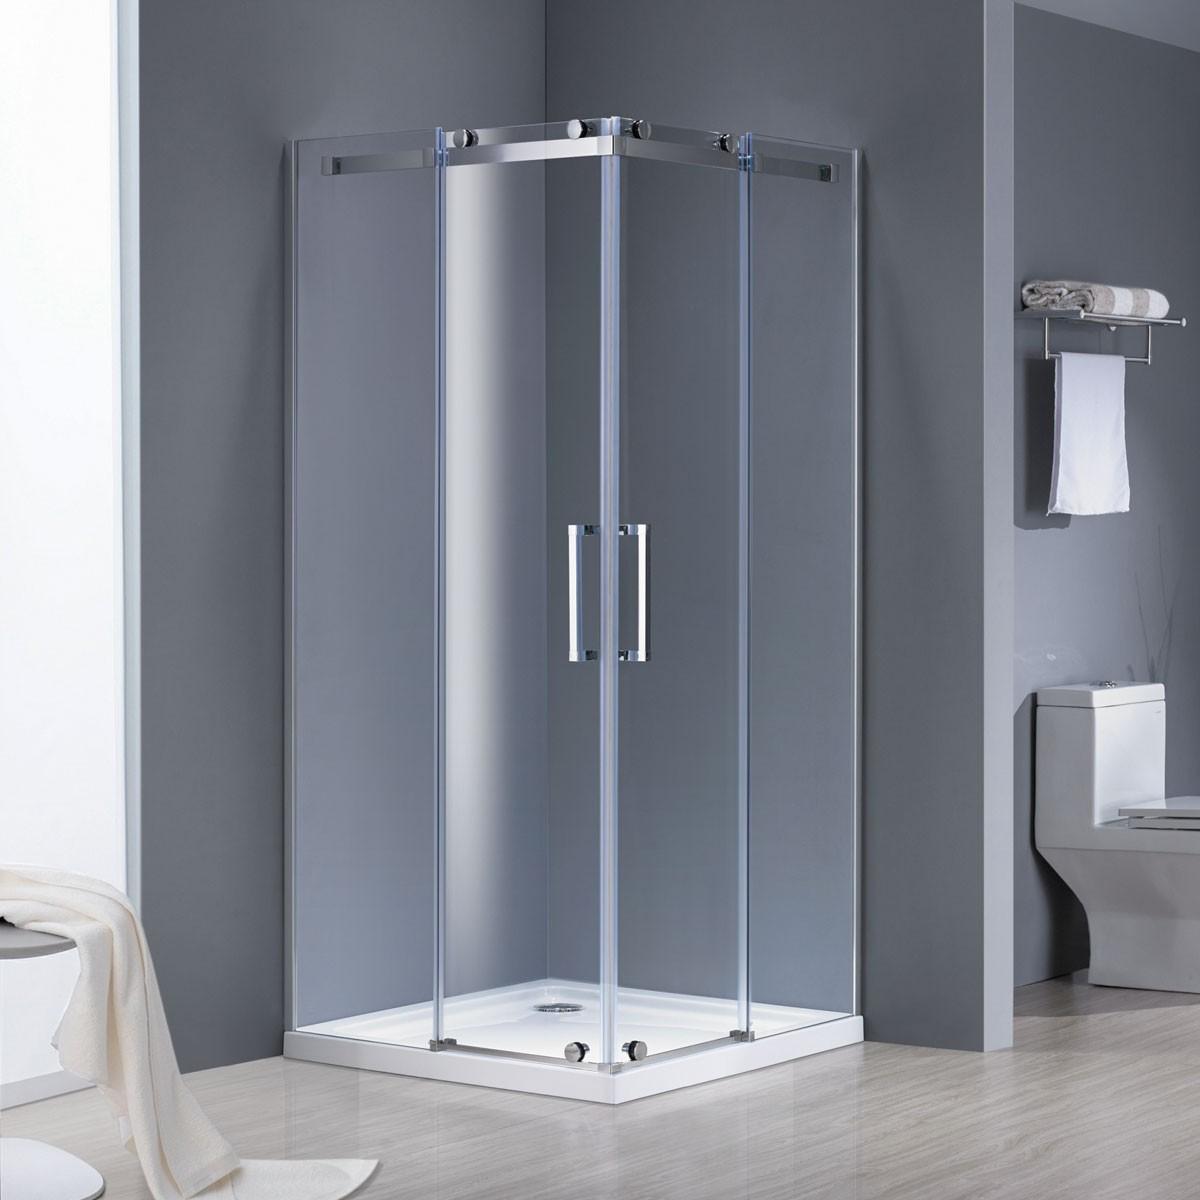 36 X 36 In Corner Entry Sliding Shower Door Dk Am6001 6